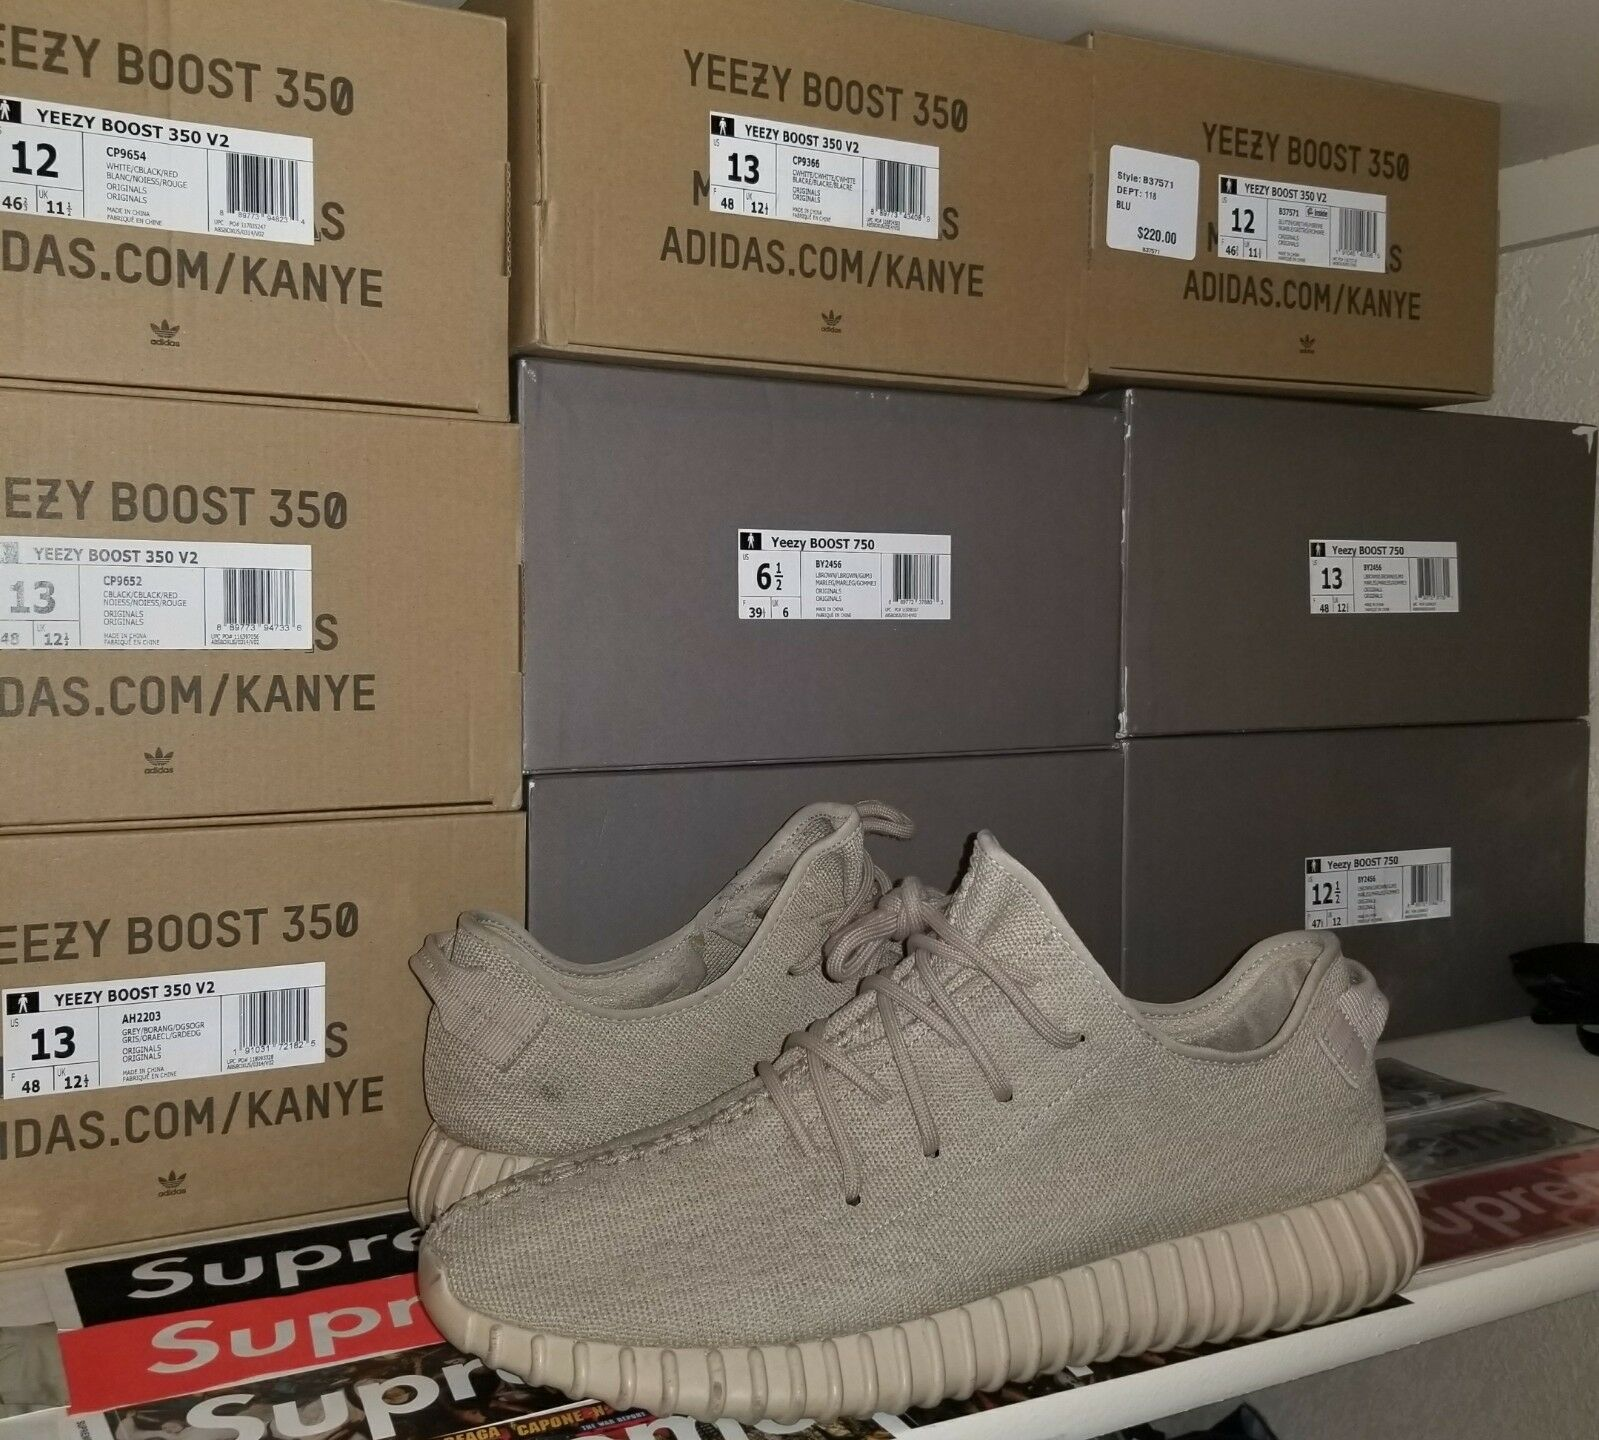 Adidas Yeezy 350 Boost Oxford Tan Tan Tan Dimensione 13 100% Authentic 077351